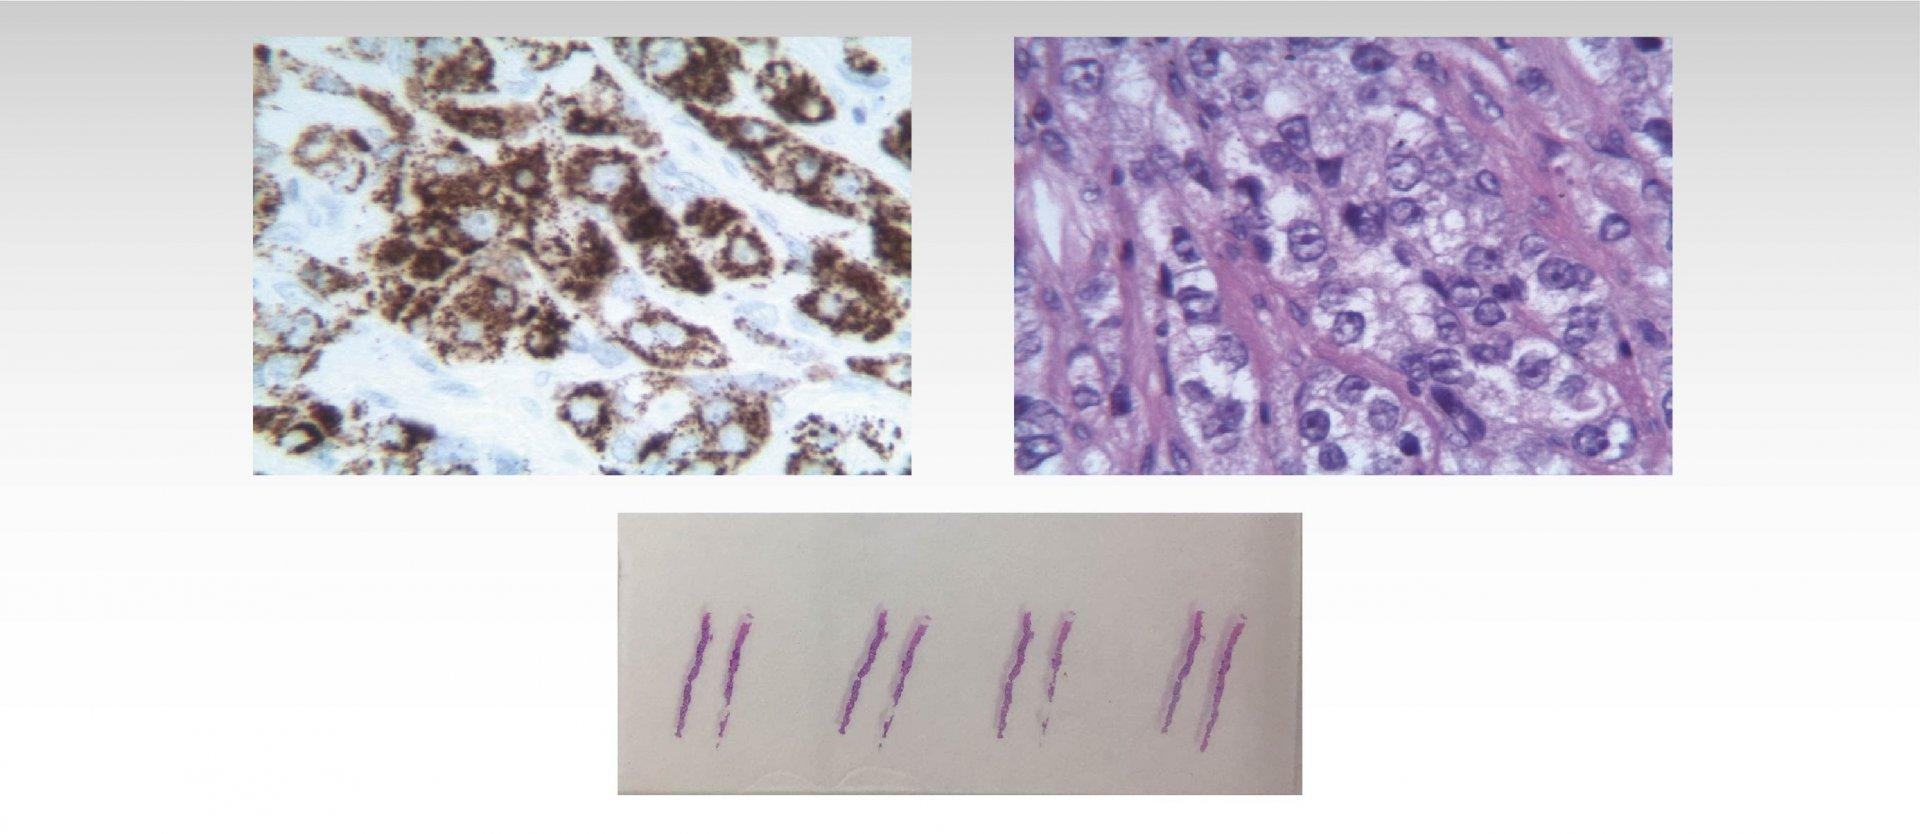 adenocarcinoma prostatico gleason 10 4